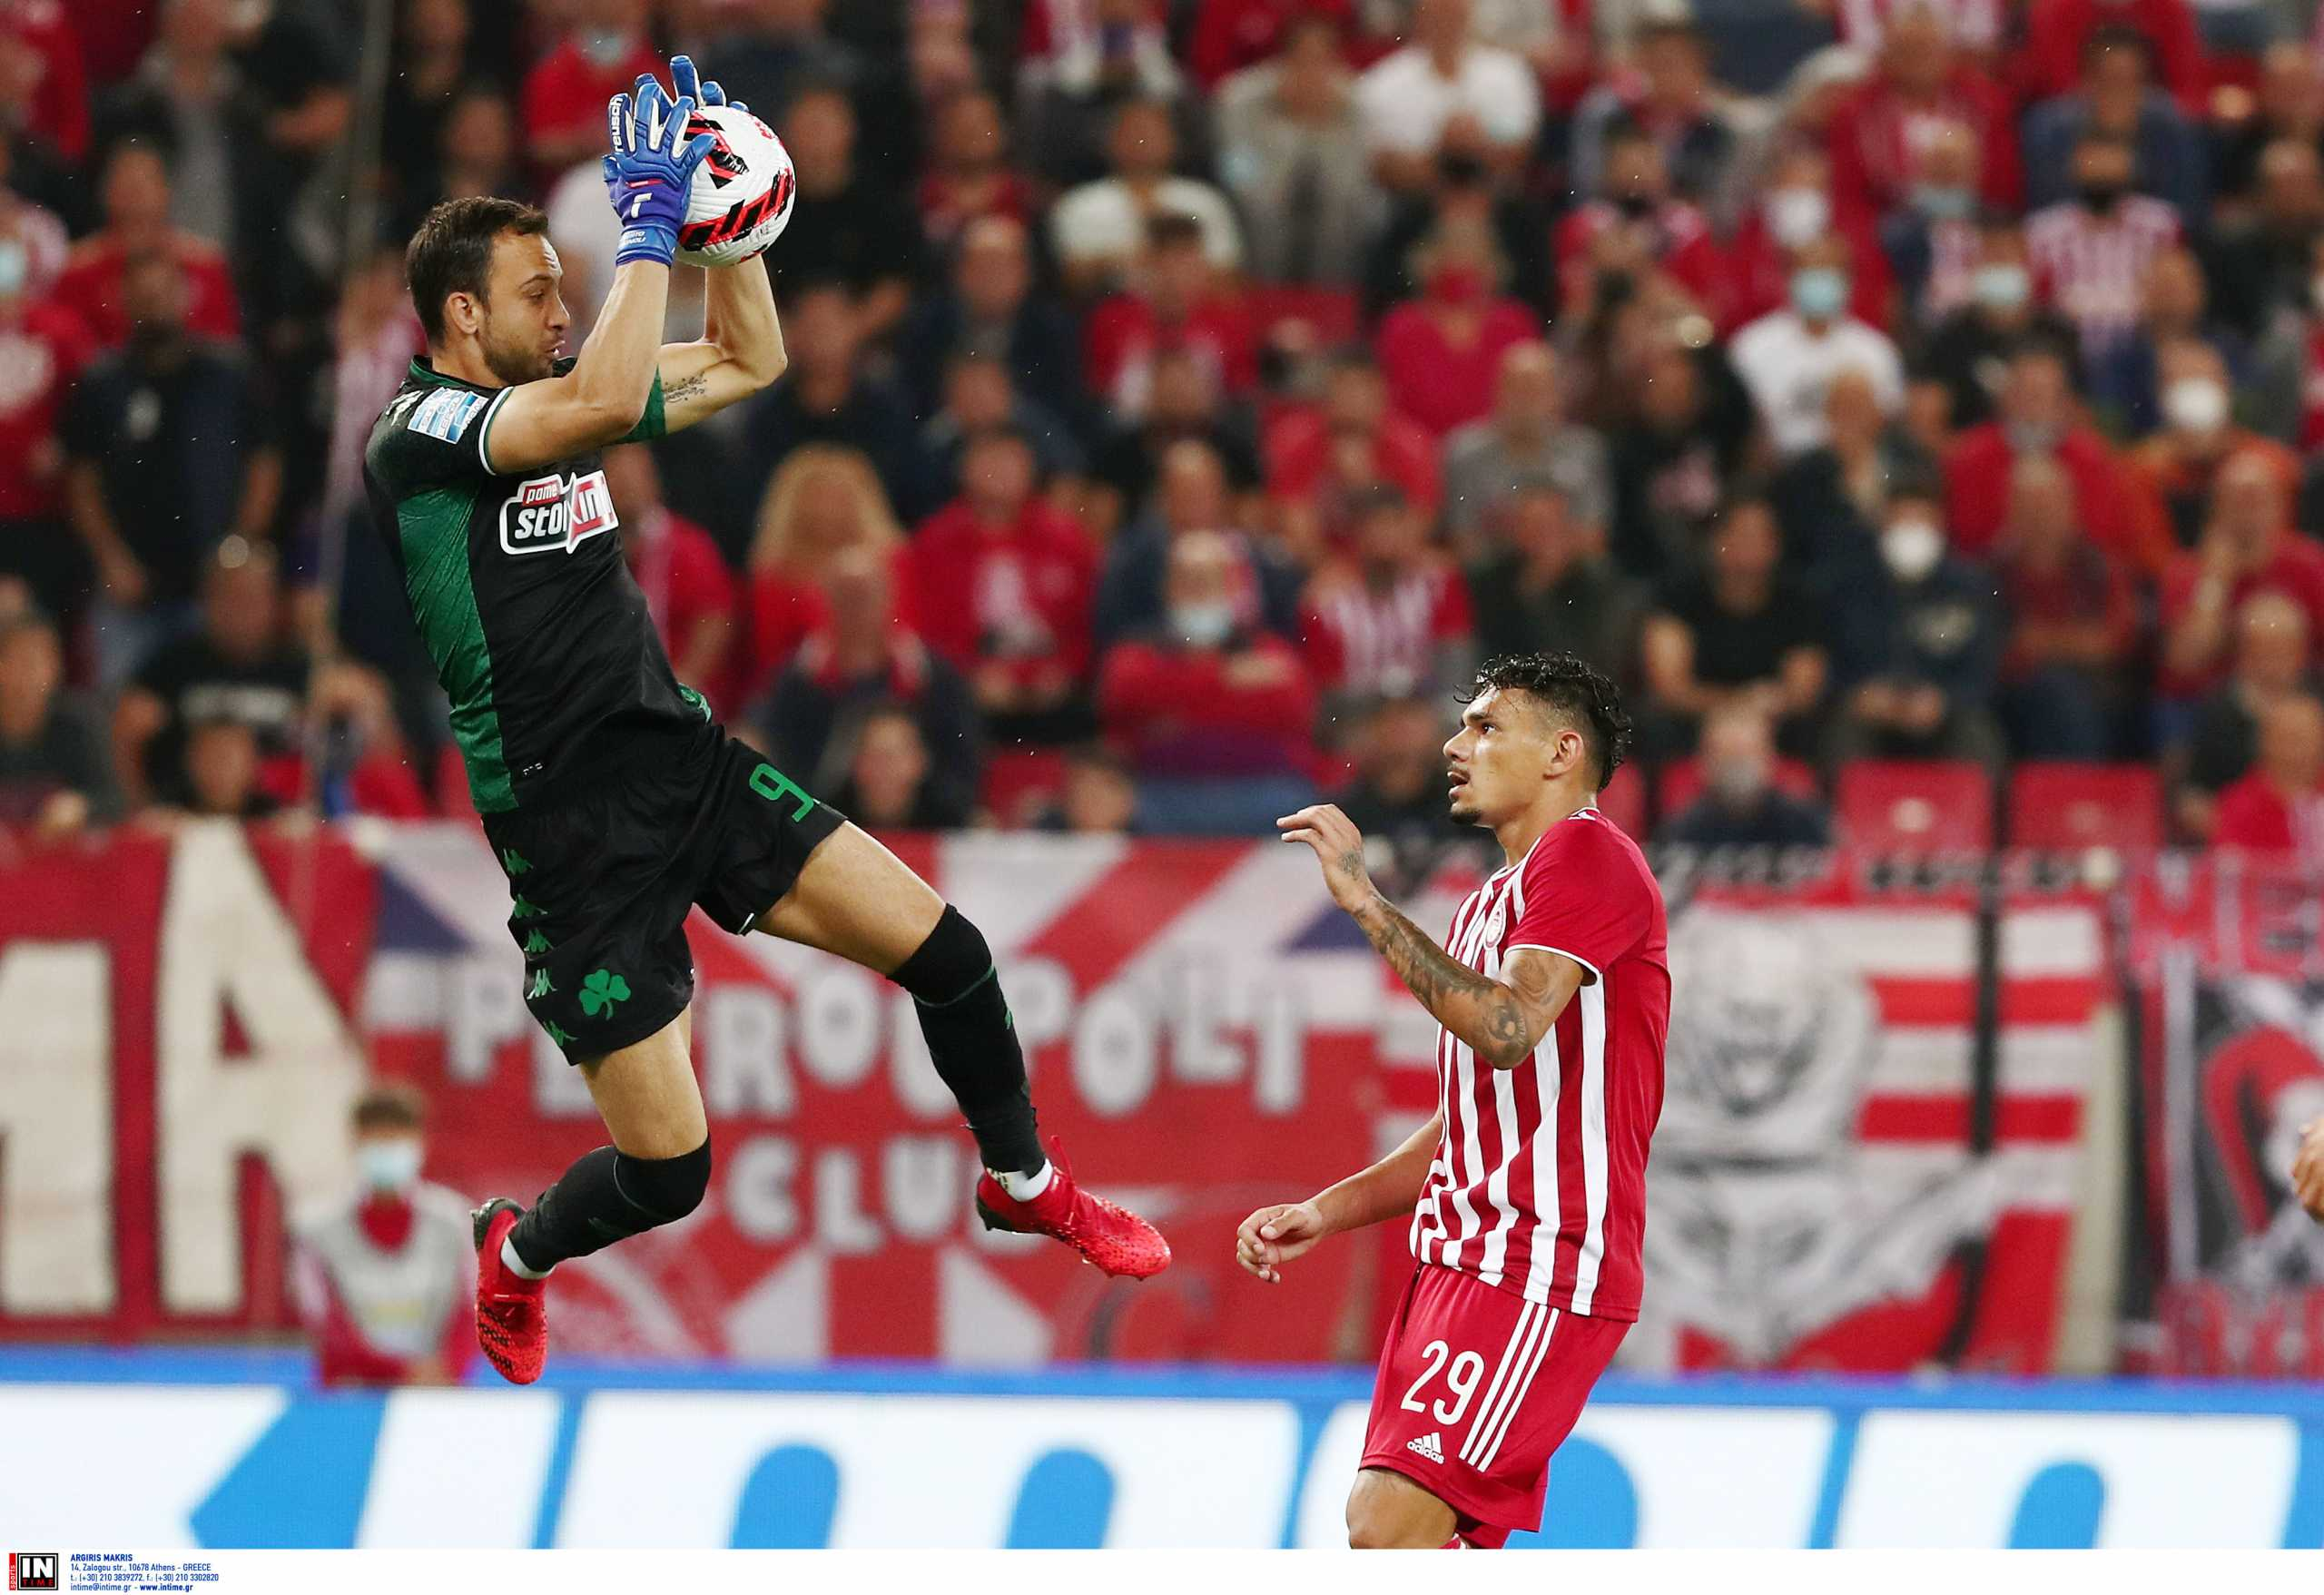 Superleague 1, Ολυμπιακός – Παναθηναϊκός 0-0: Μπρινιόλι και άμυνα σταμάτησαν τους Πειραιώτες